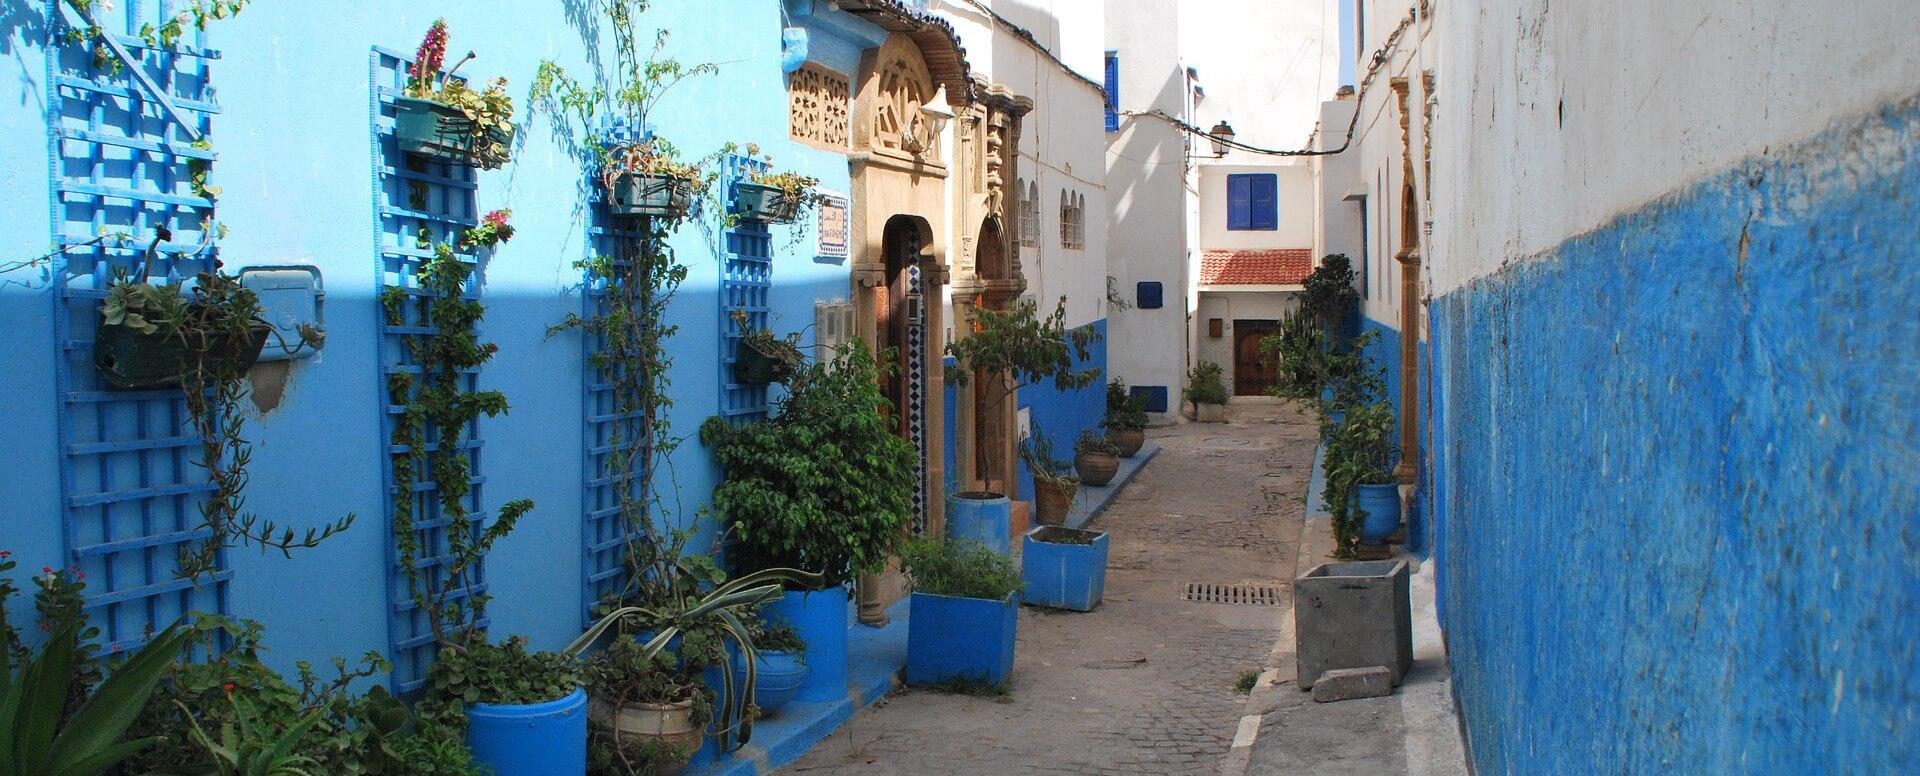 4. Petite balade dans la ville de Rabat - Maroc